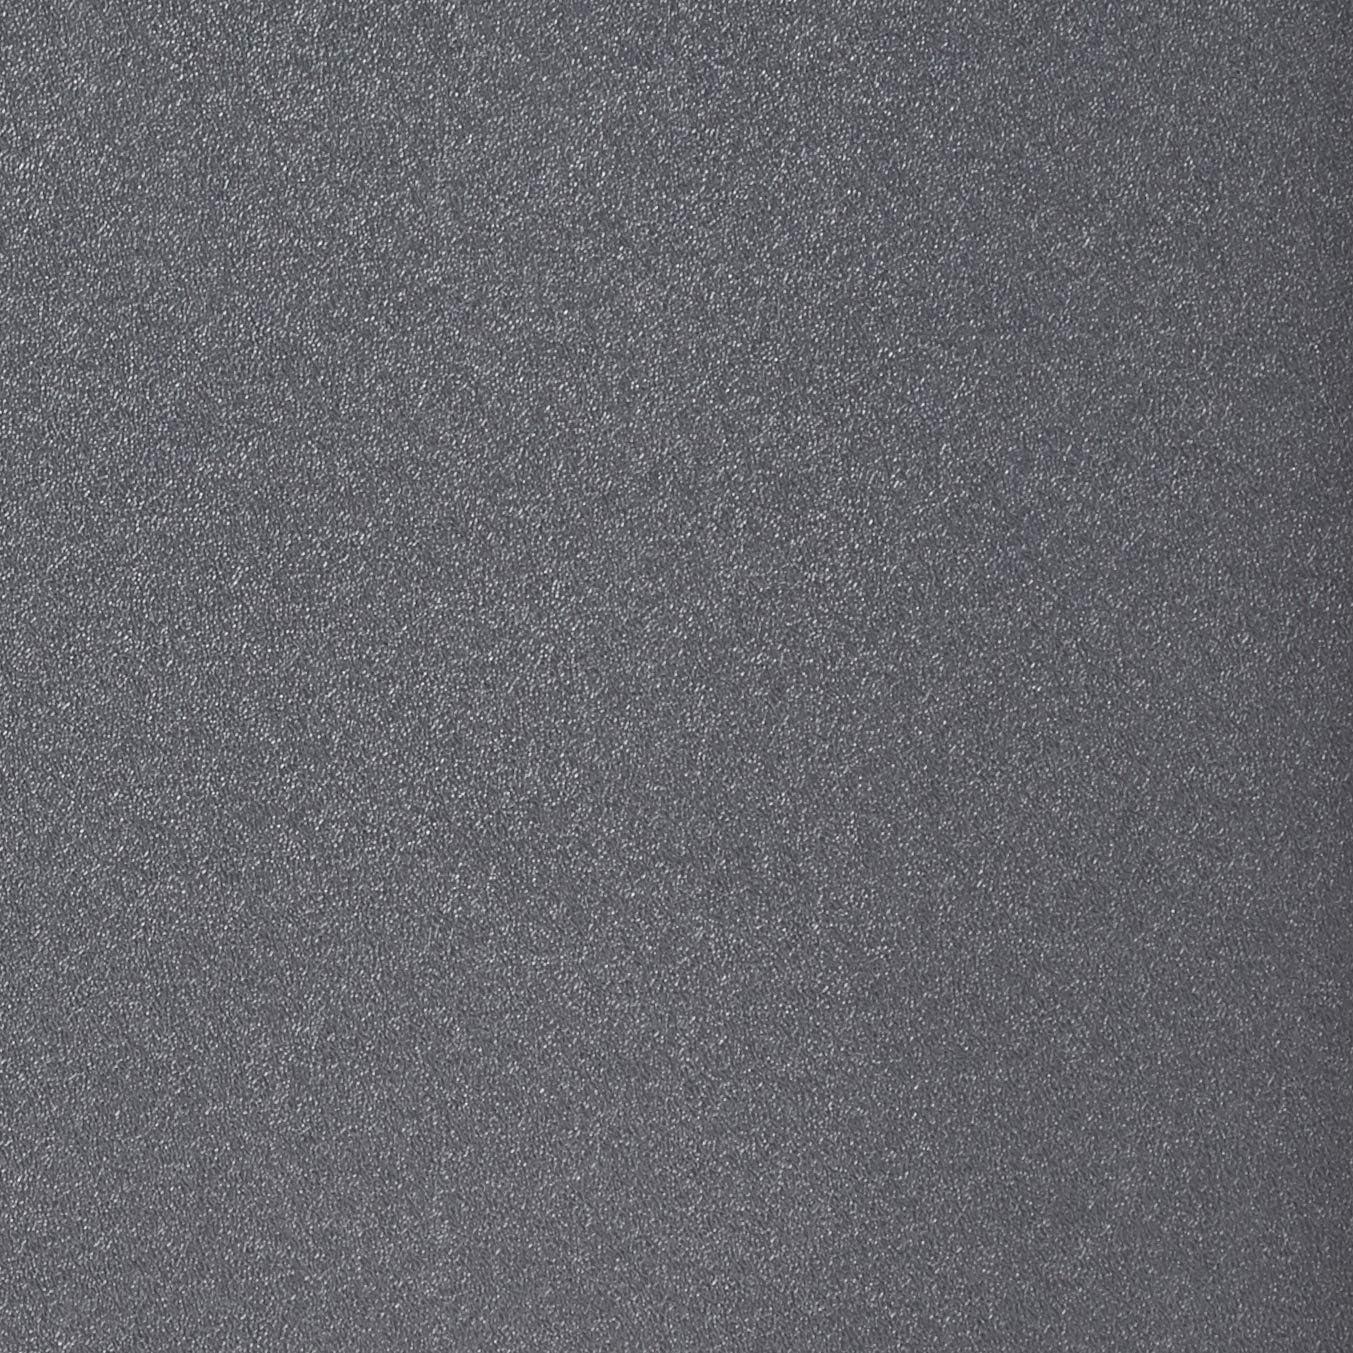 25 x 22,8 x 3,4 cm Tablero DM, 25 x 22,8 x 3,4 cm Negro ModulHome 6RAN790BC Estanter/ía para Colgar Tablero//Madera DM